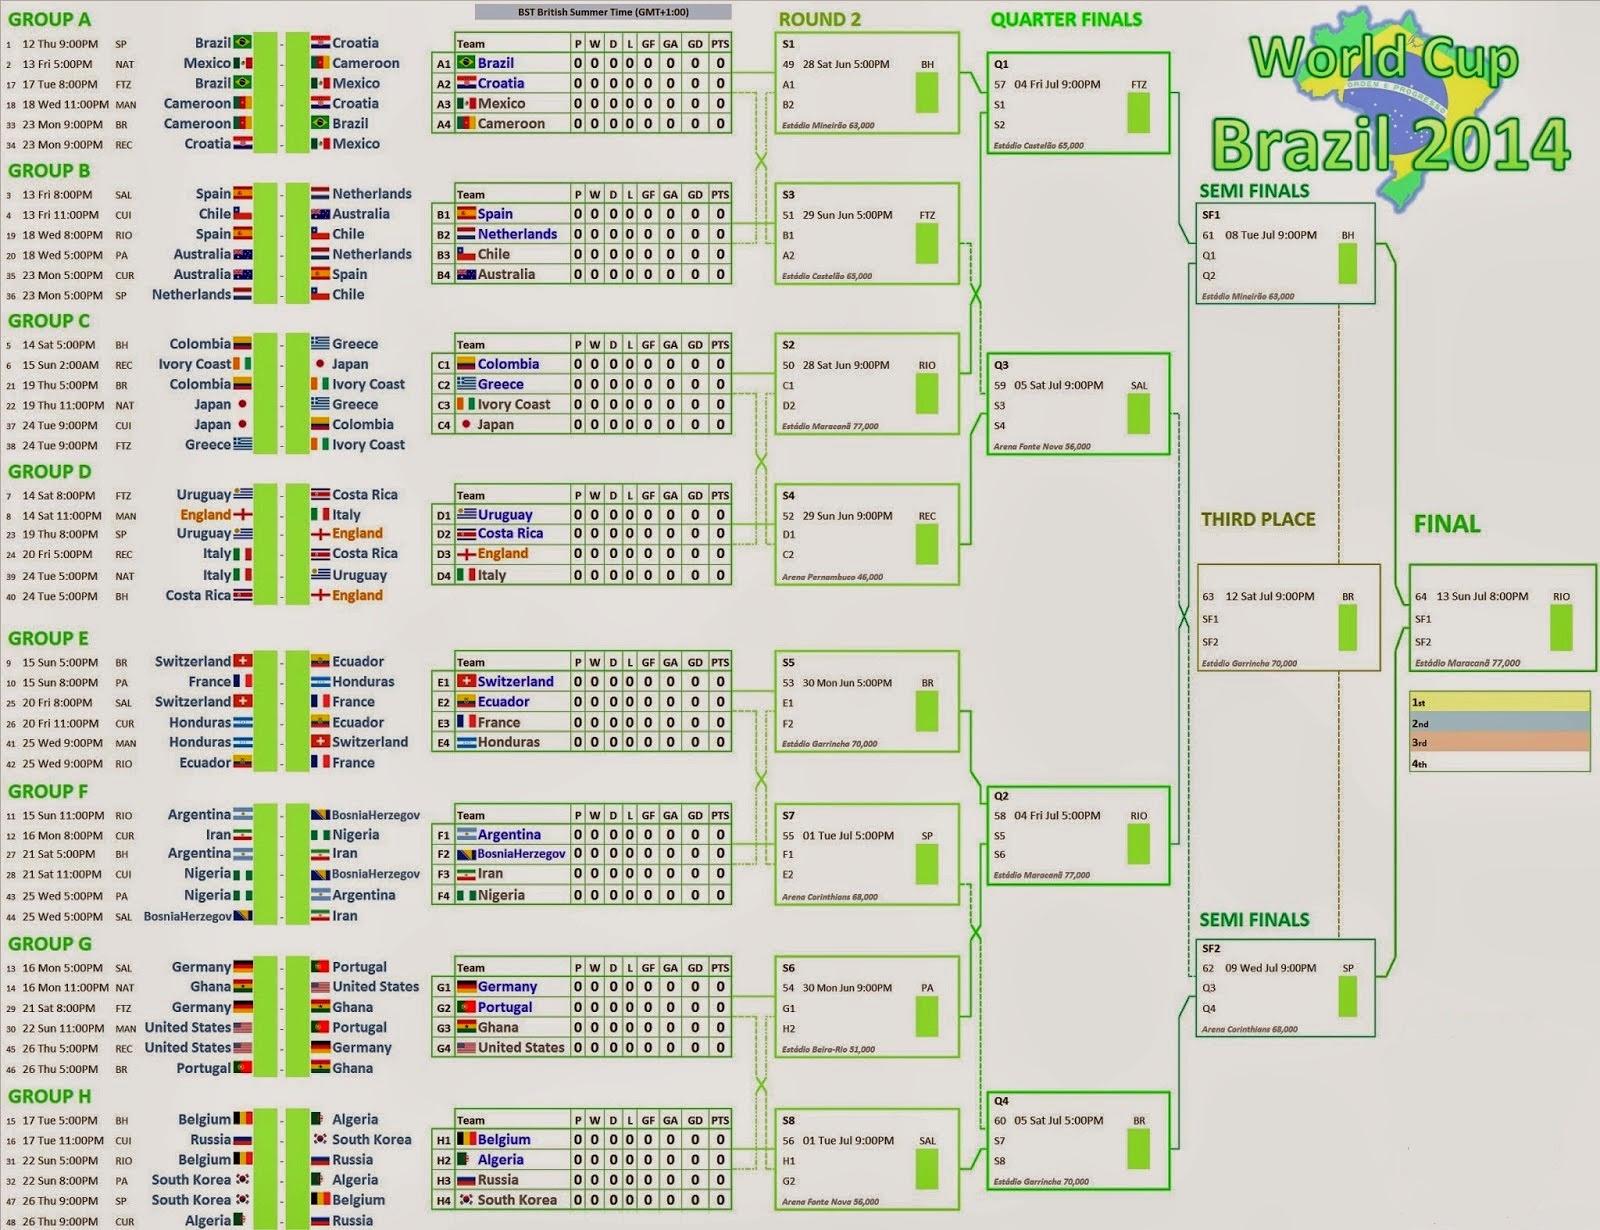 Jadwal Pertandingan Piala Dunia FIFA 2014 di Brasil